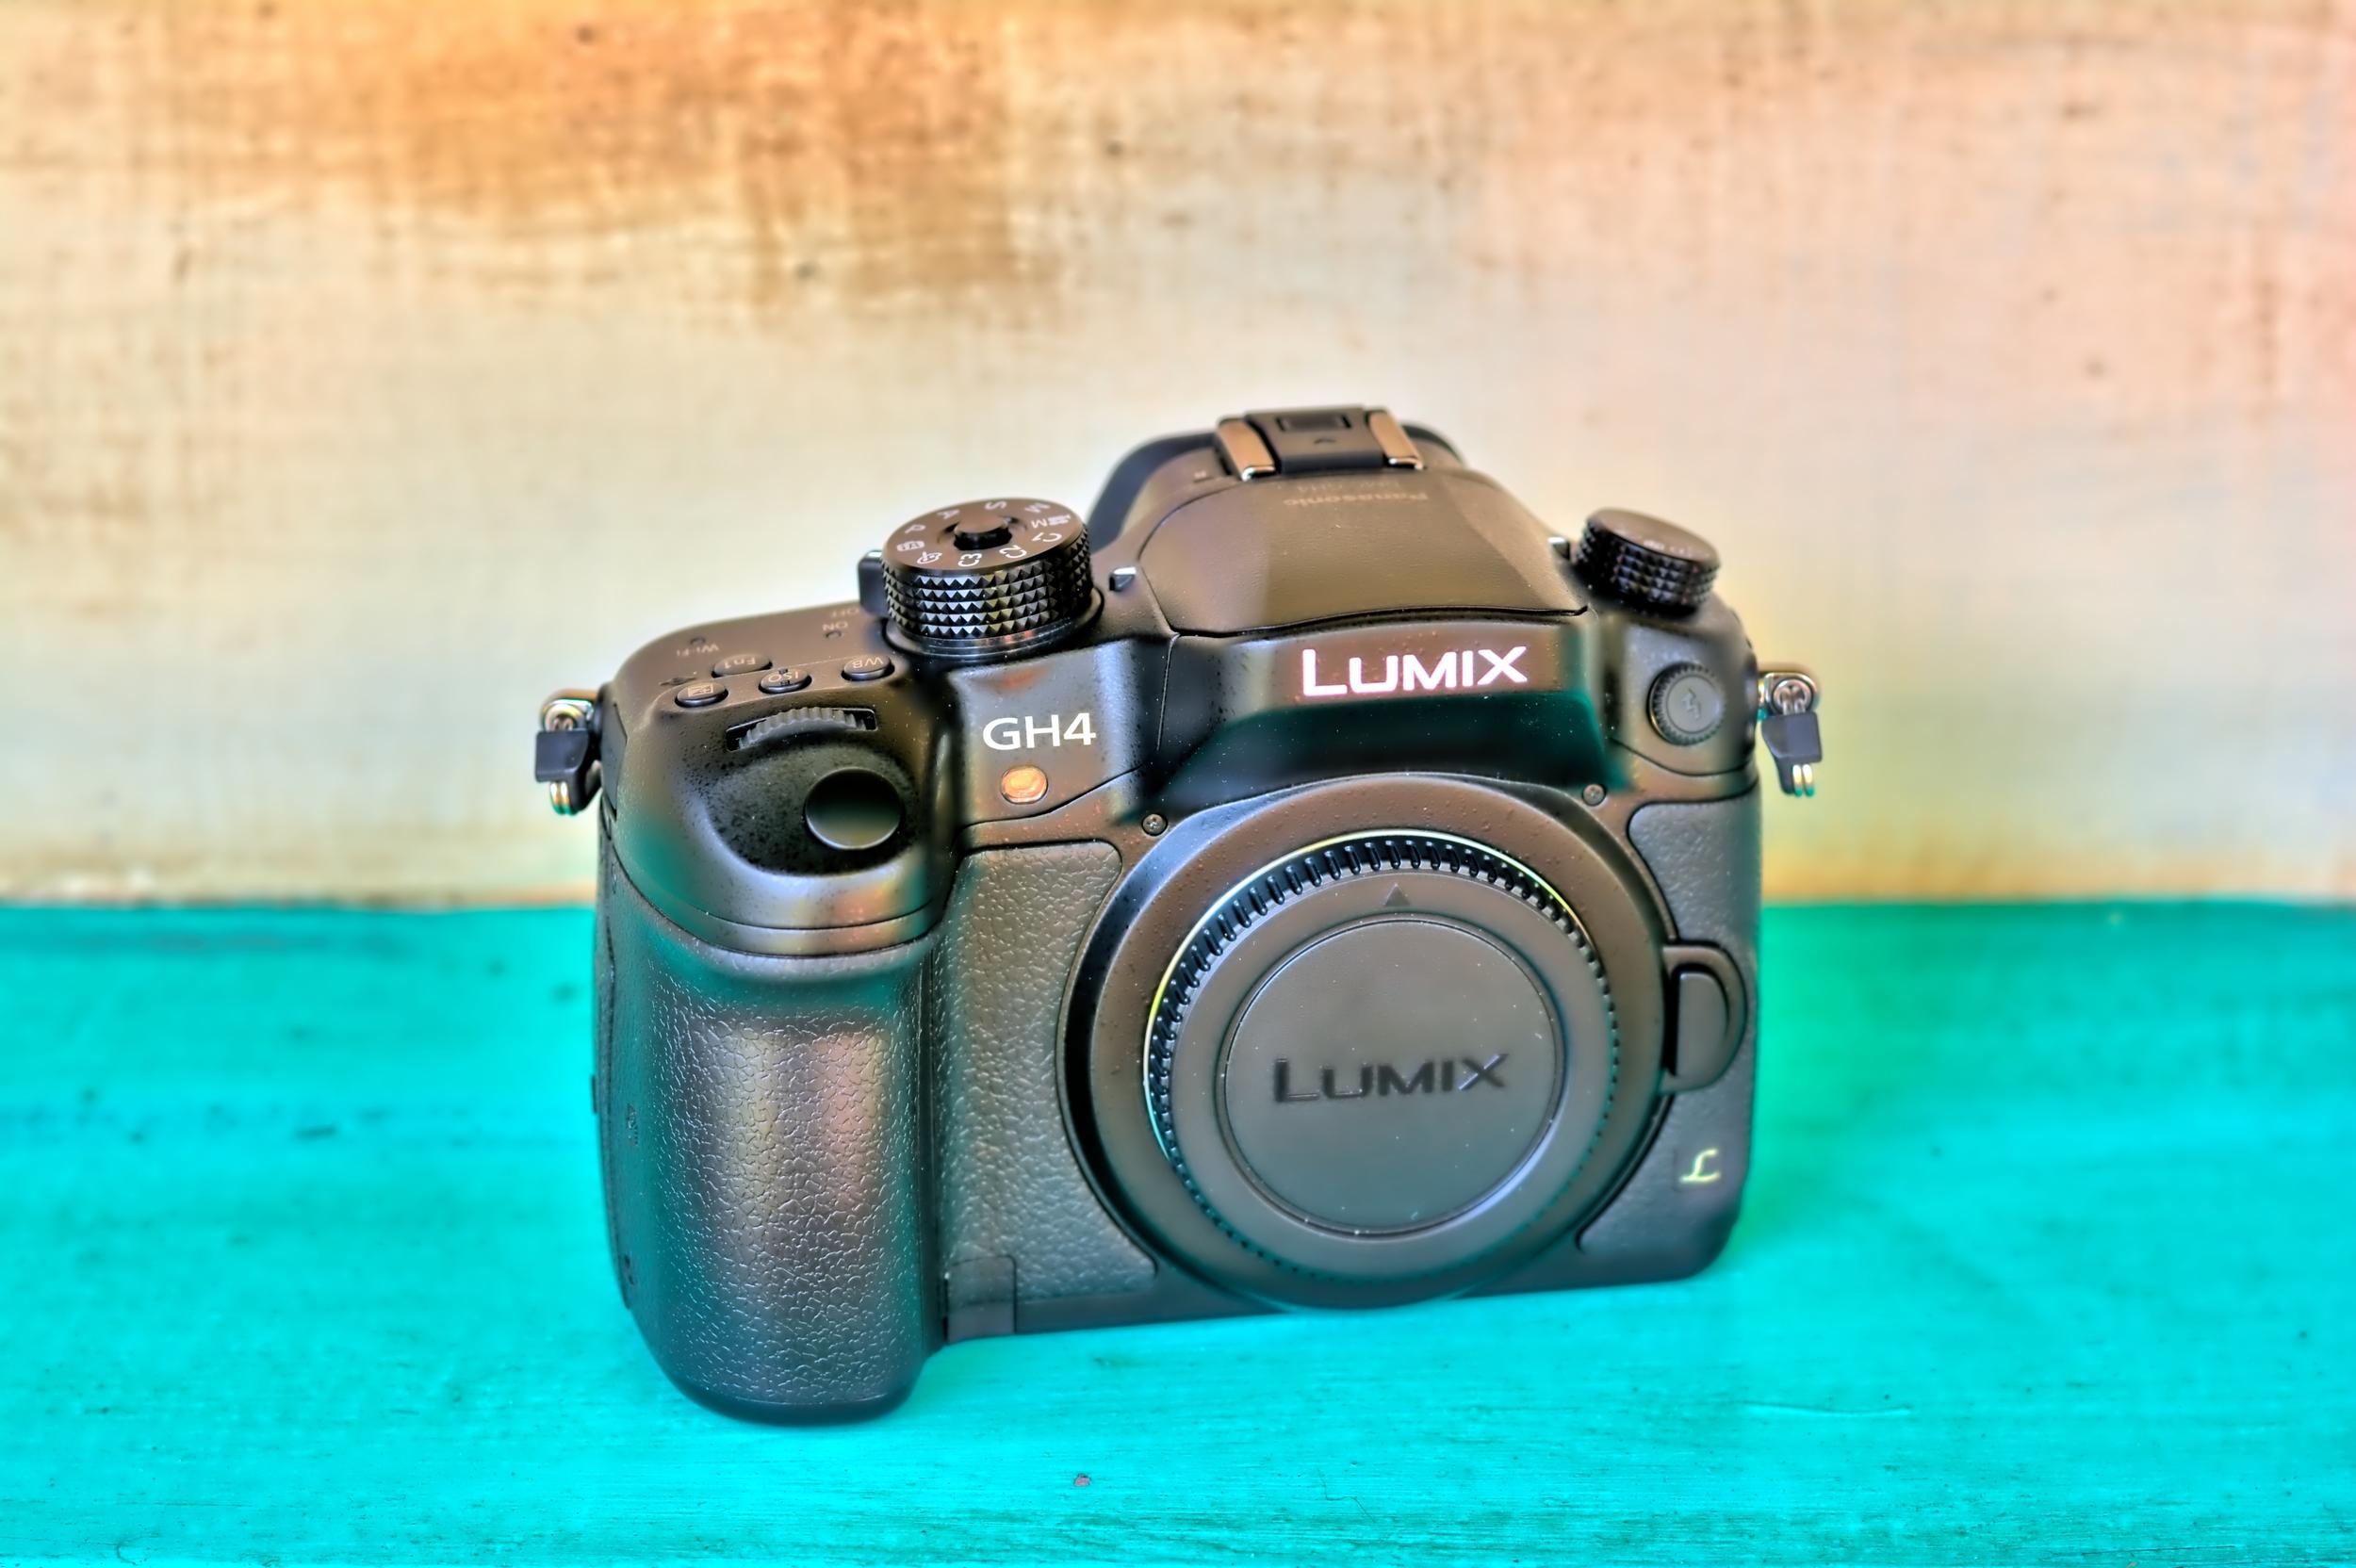 Panasonic Lumix GH4 Full Frame 4K DSLR Camera